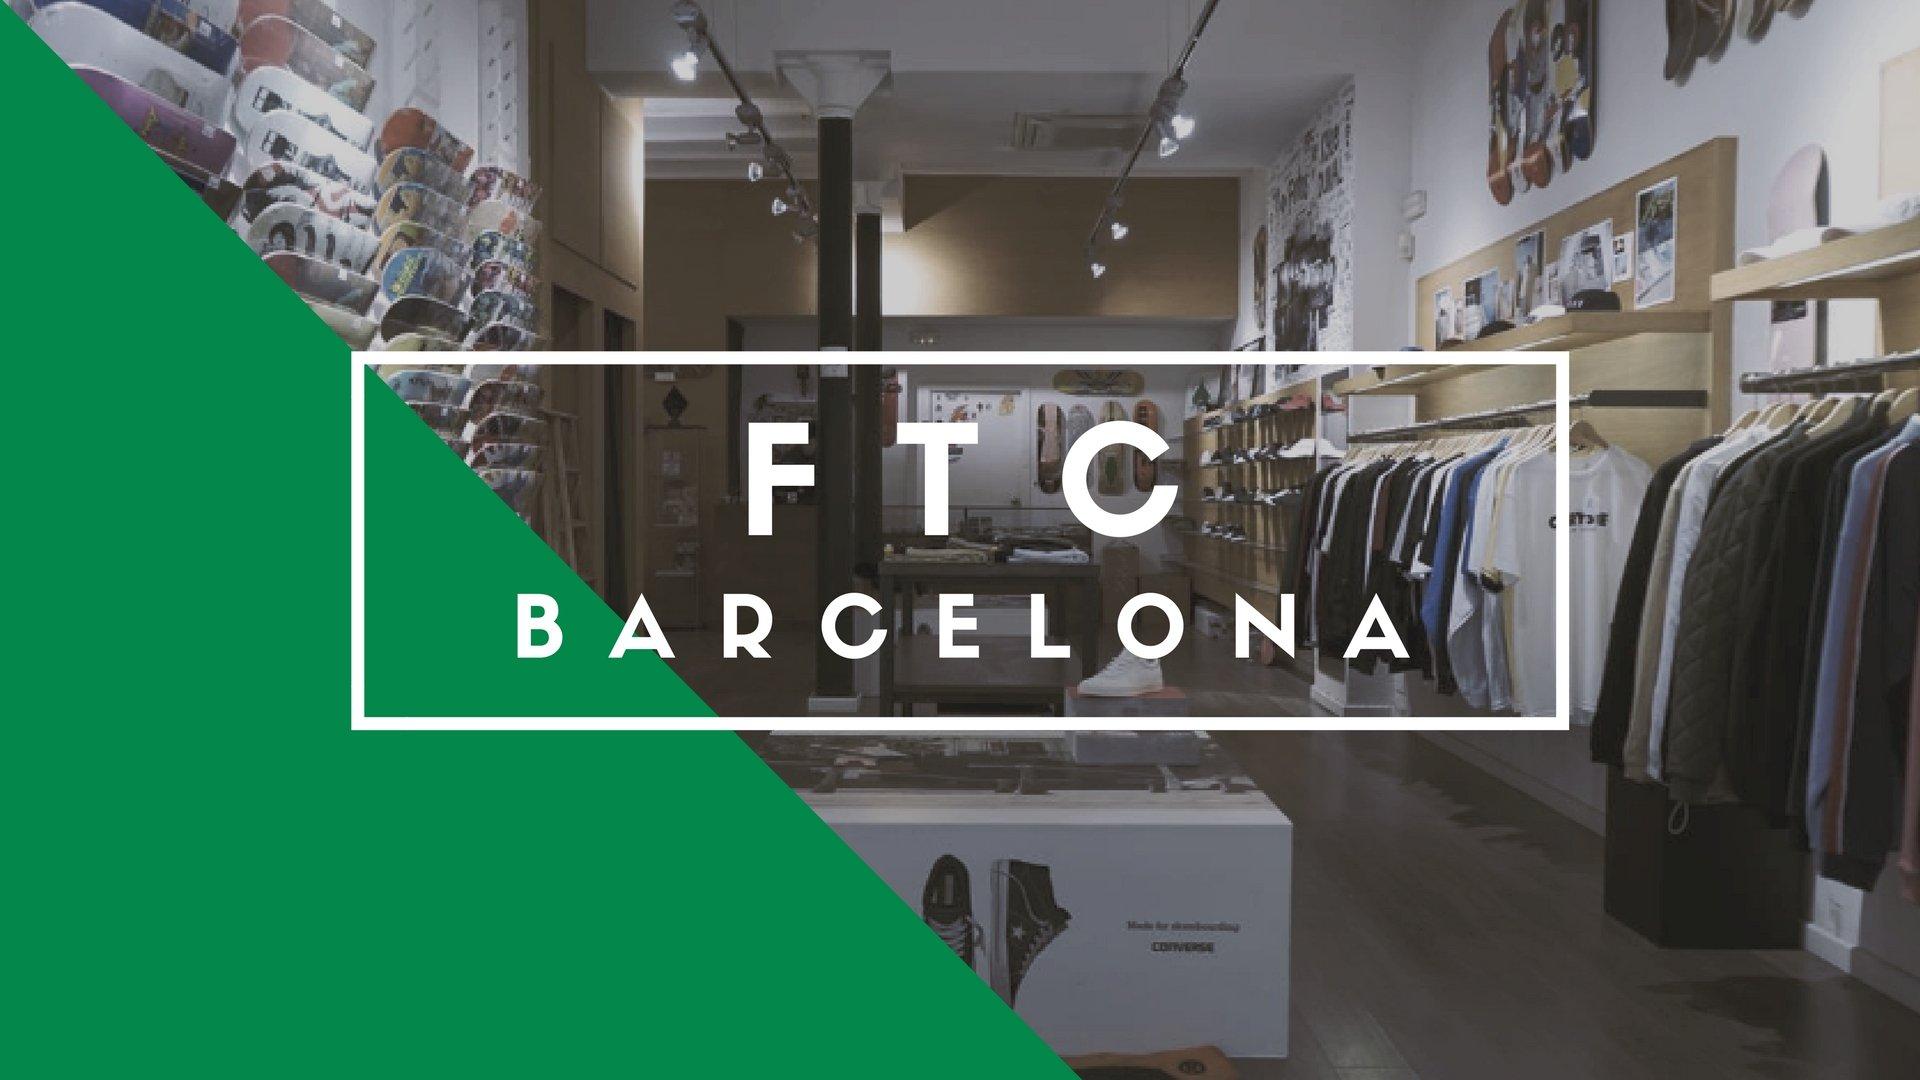 FTC Barcelona